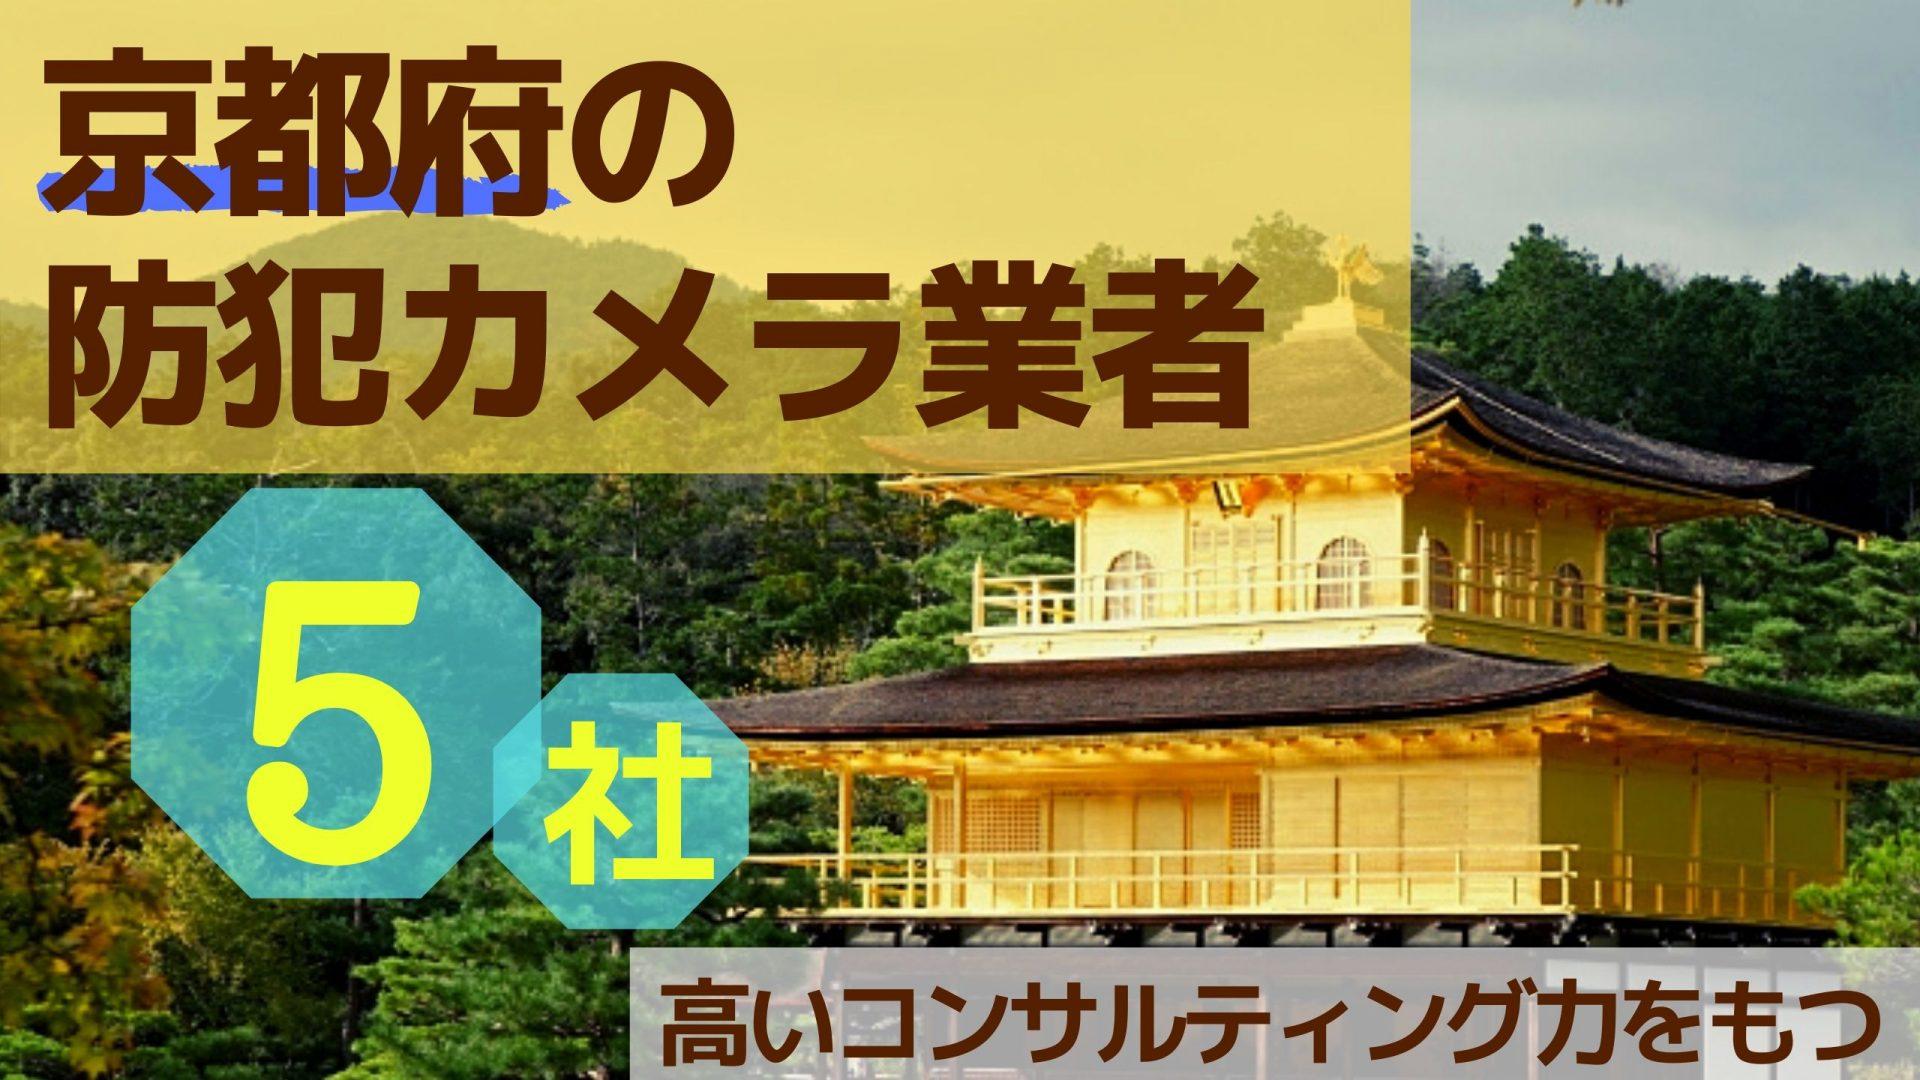 b185a0689aee61b02ab61cd8db9d8cf1 - 京都府で高いコンサルティング力をもつ防犯カメラ業者5選!